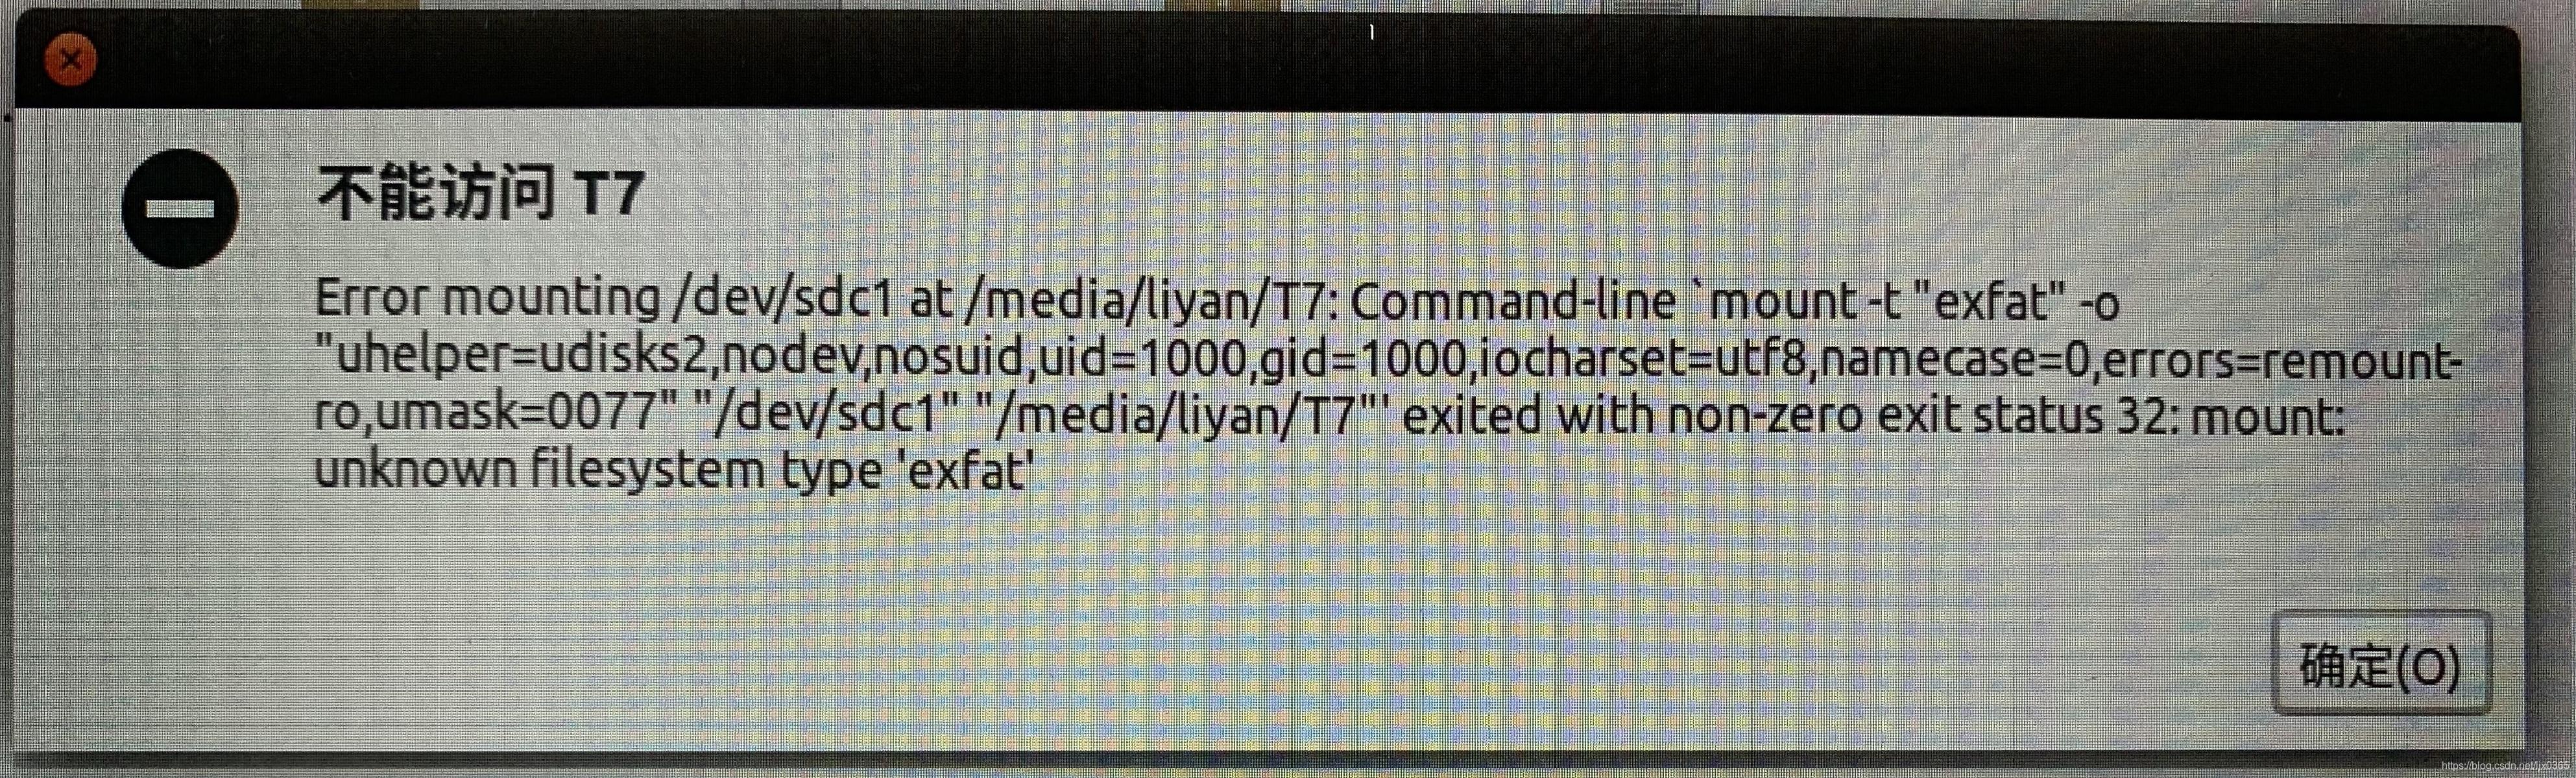 ](https://img-blog.csdnimg.cn/20200724094515331.jpg?x-oss-process=image/watermark,type_ZmFuZ3poZW5naGVpdGk,shadow_10,text_aHR0cHM6Ly9ibG9nLmNzZG4ubmV0L2xqeDAzNjU=,size_16,color_FFFFFF,t_70)